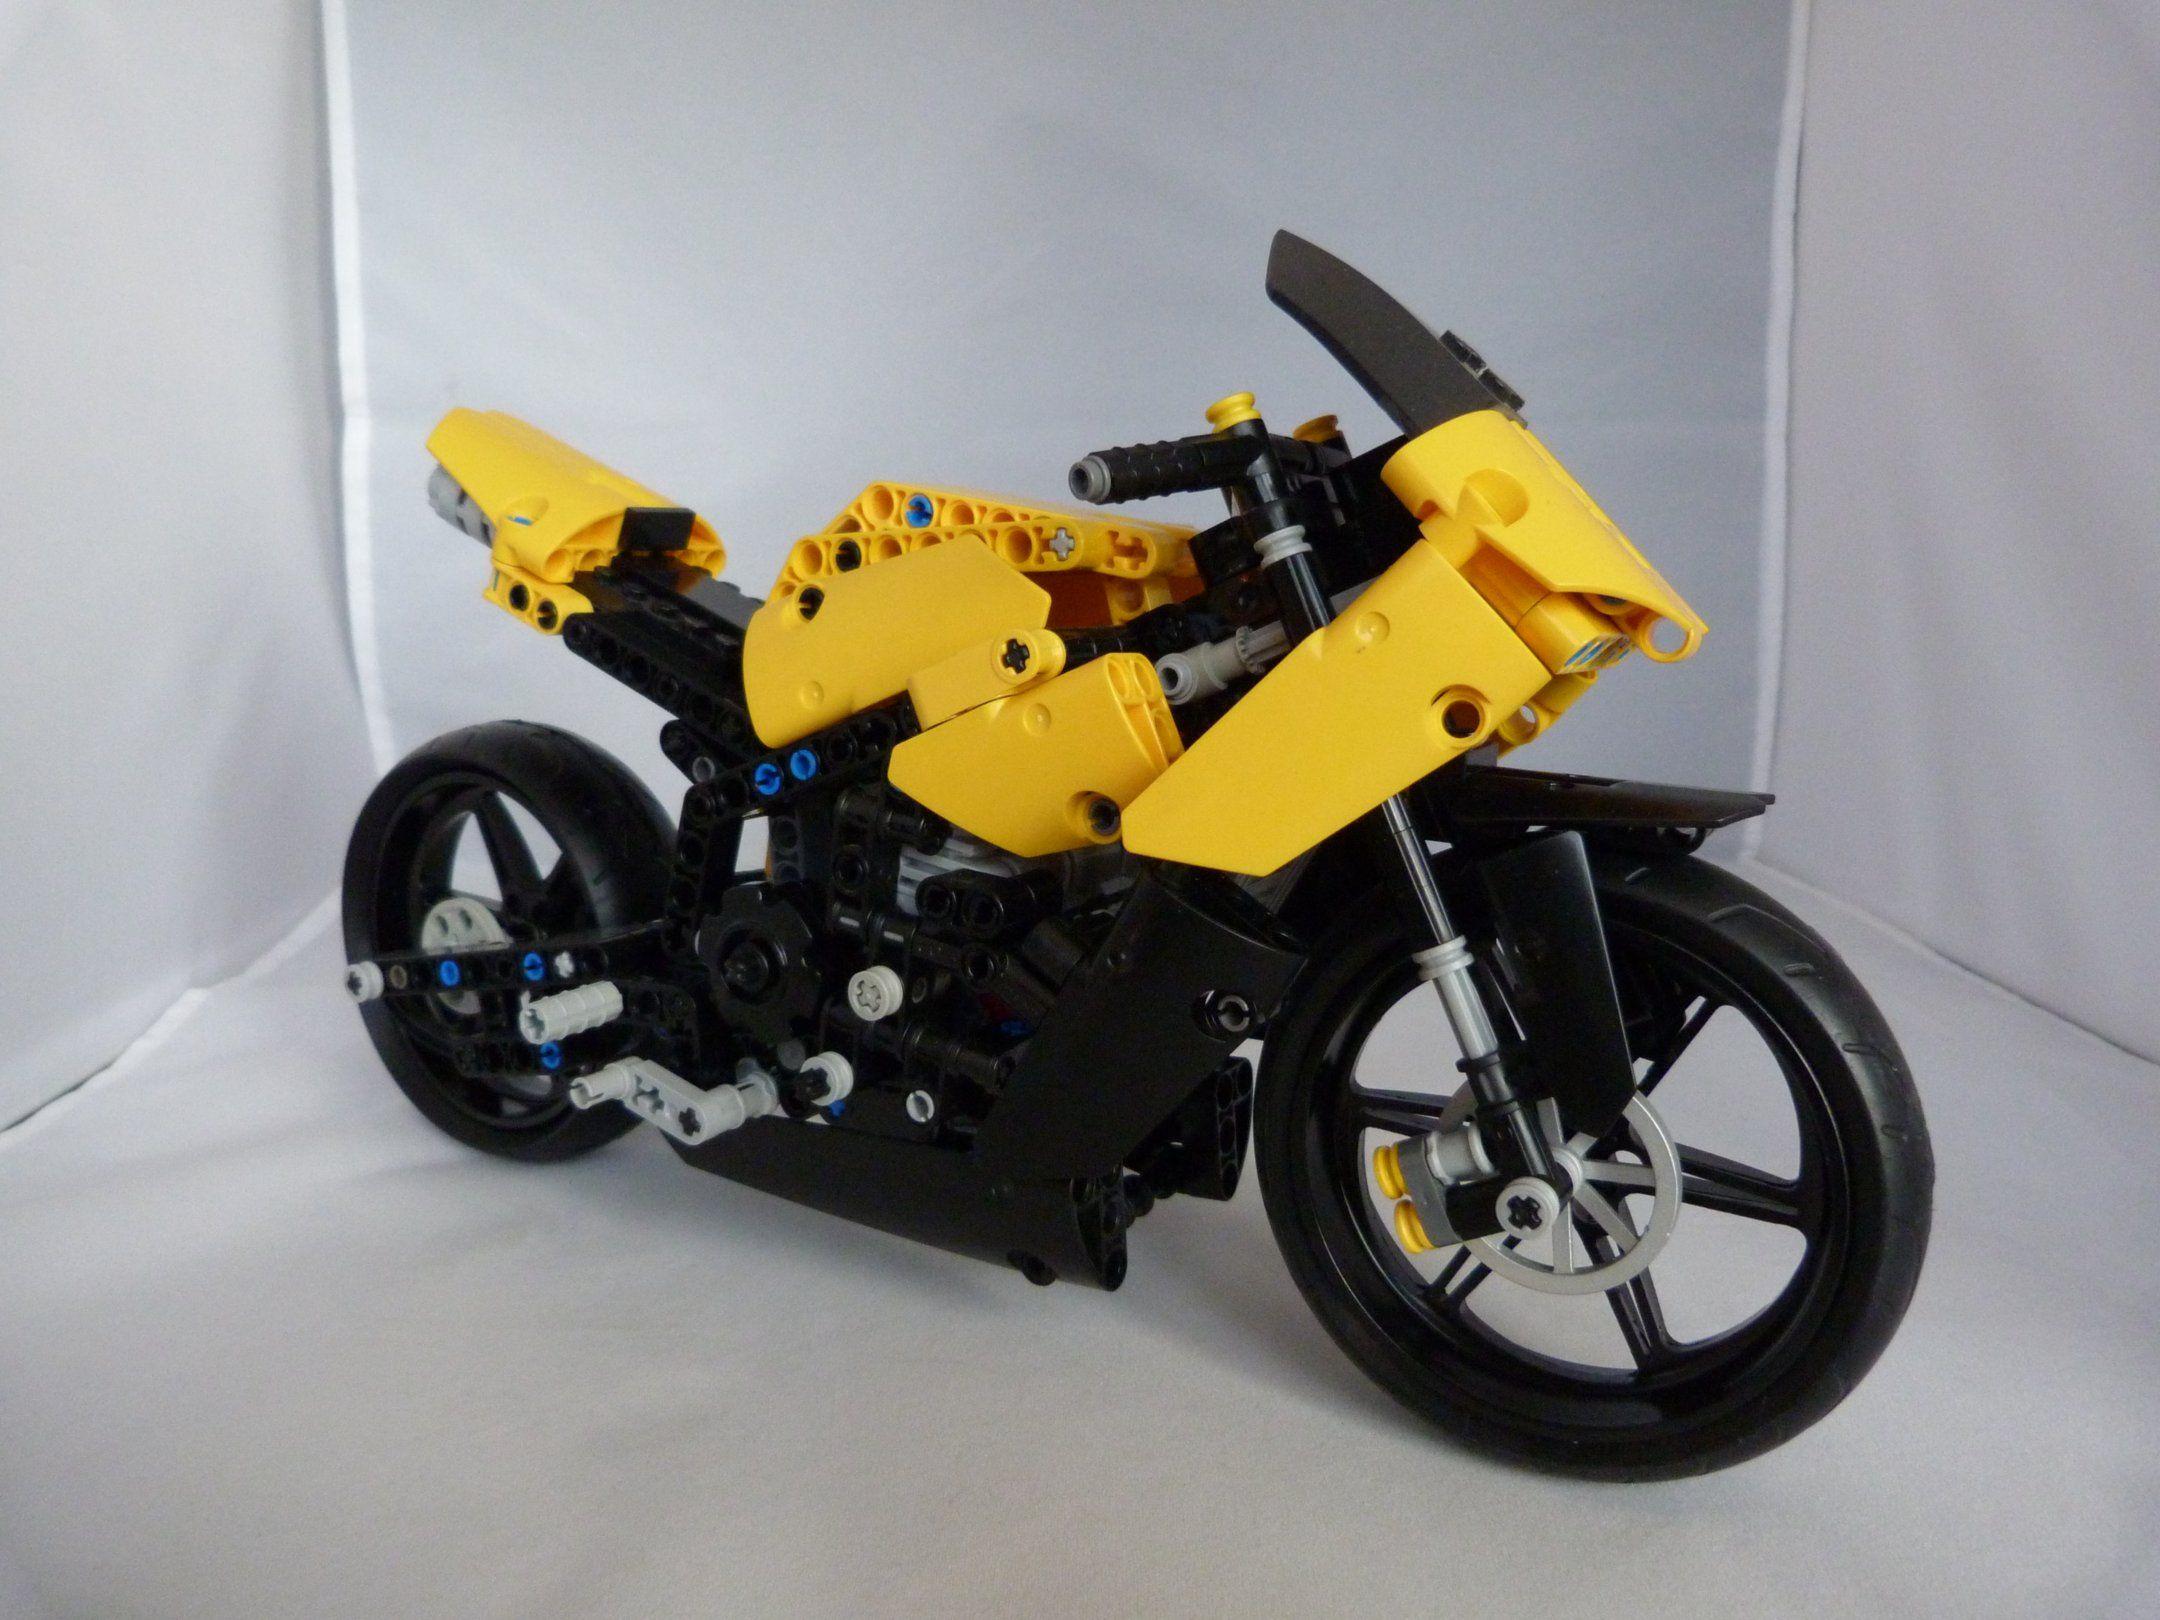 [MOC] LEGO TECHNIC YAMAHA R1 [MOC] NEMOOZ Lego